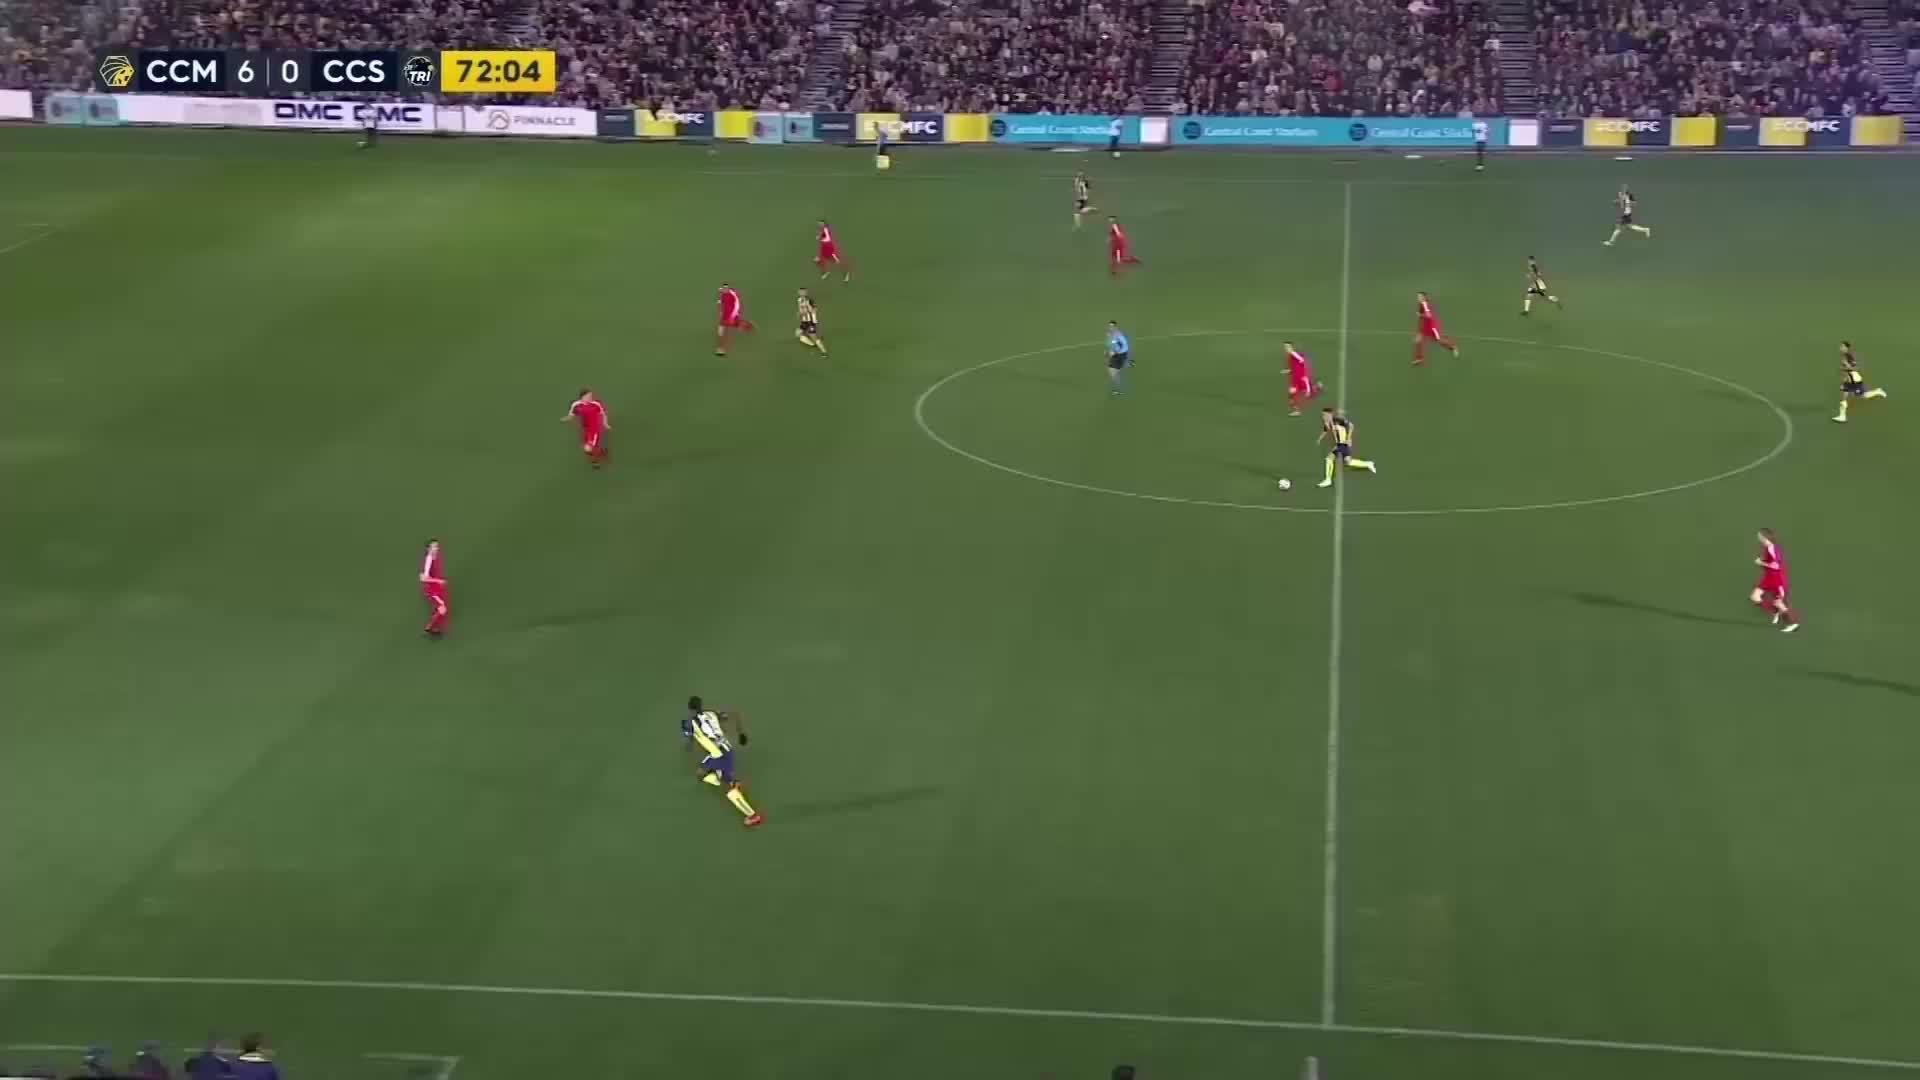 soccer, Usain Bolt - Central Coast Mariners GIFs